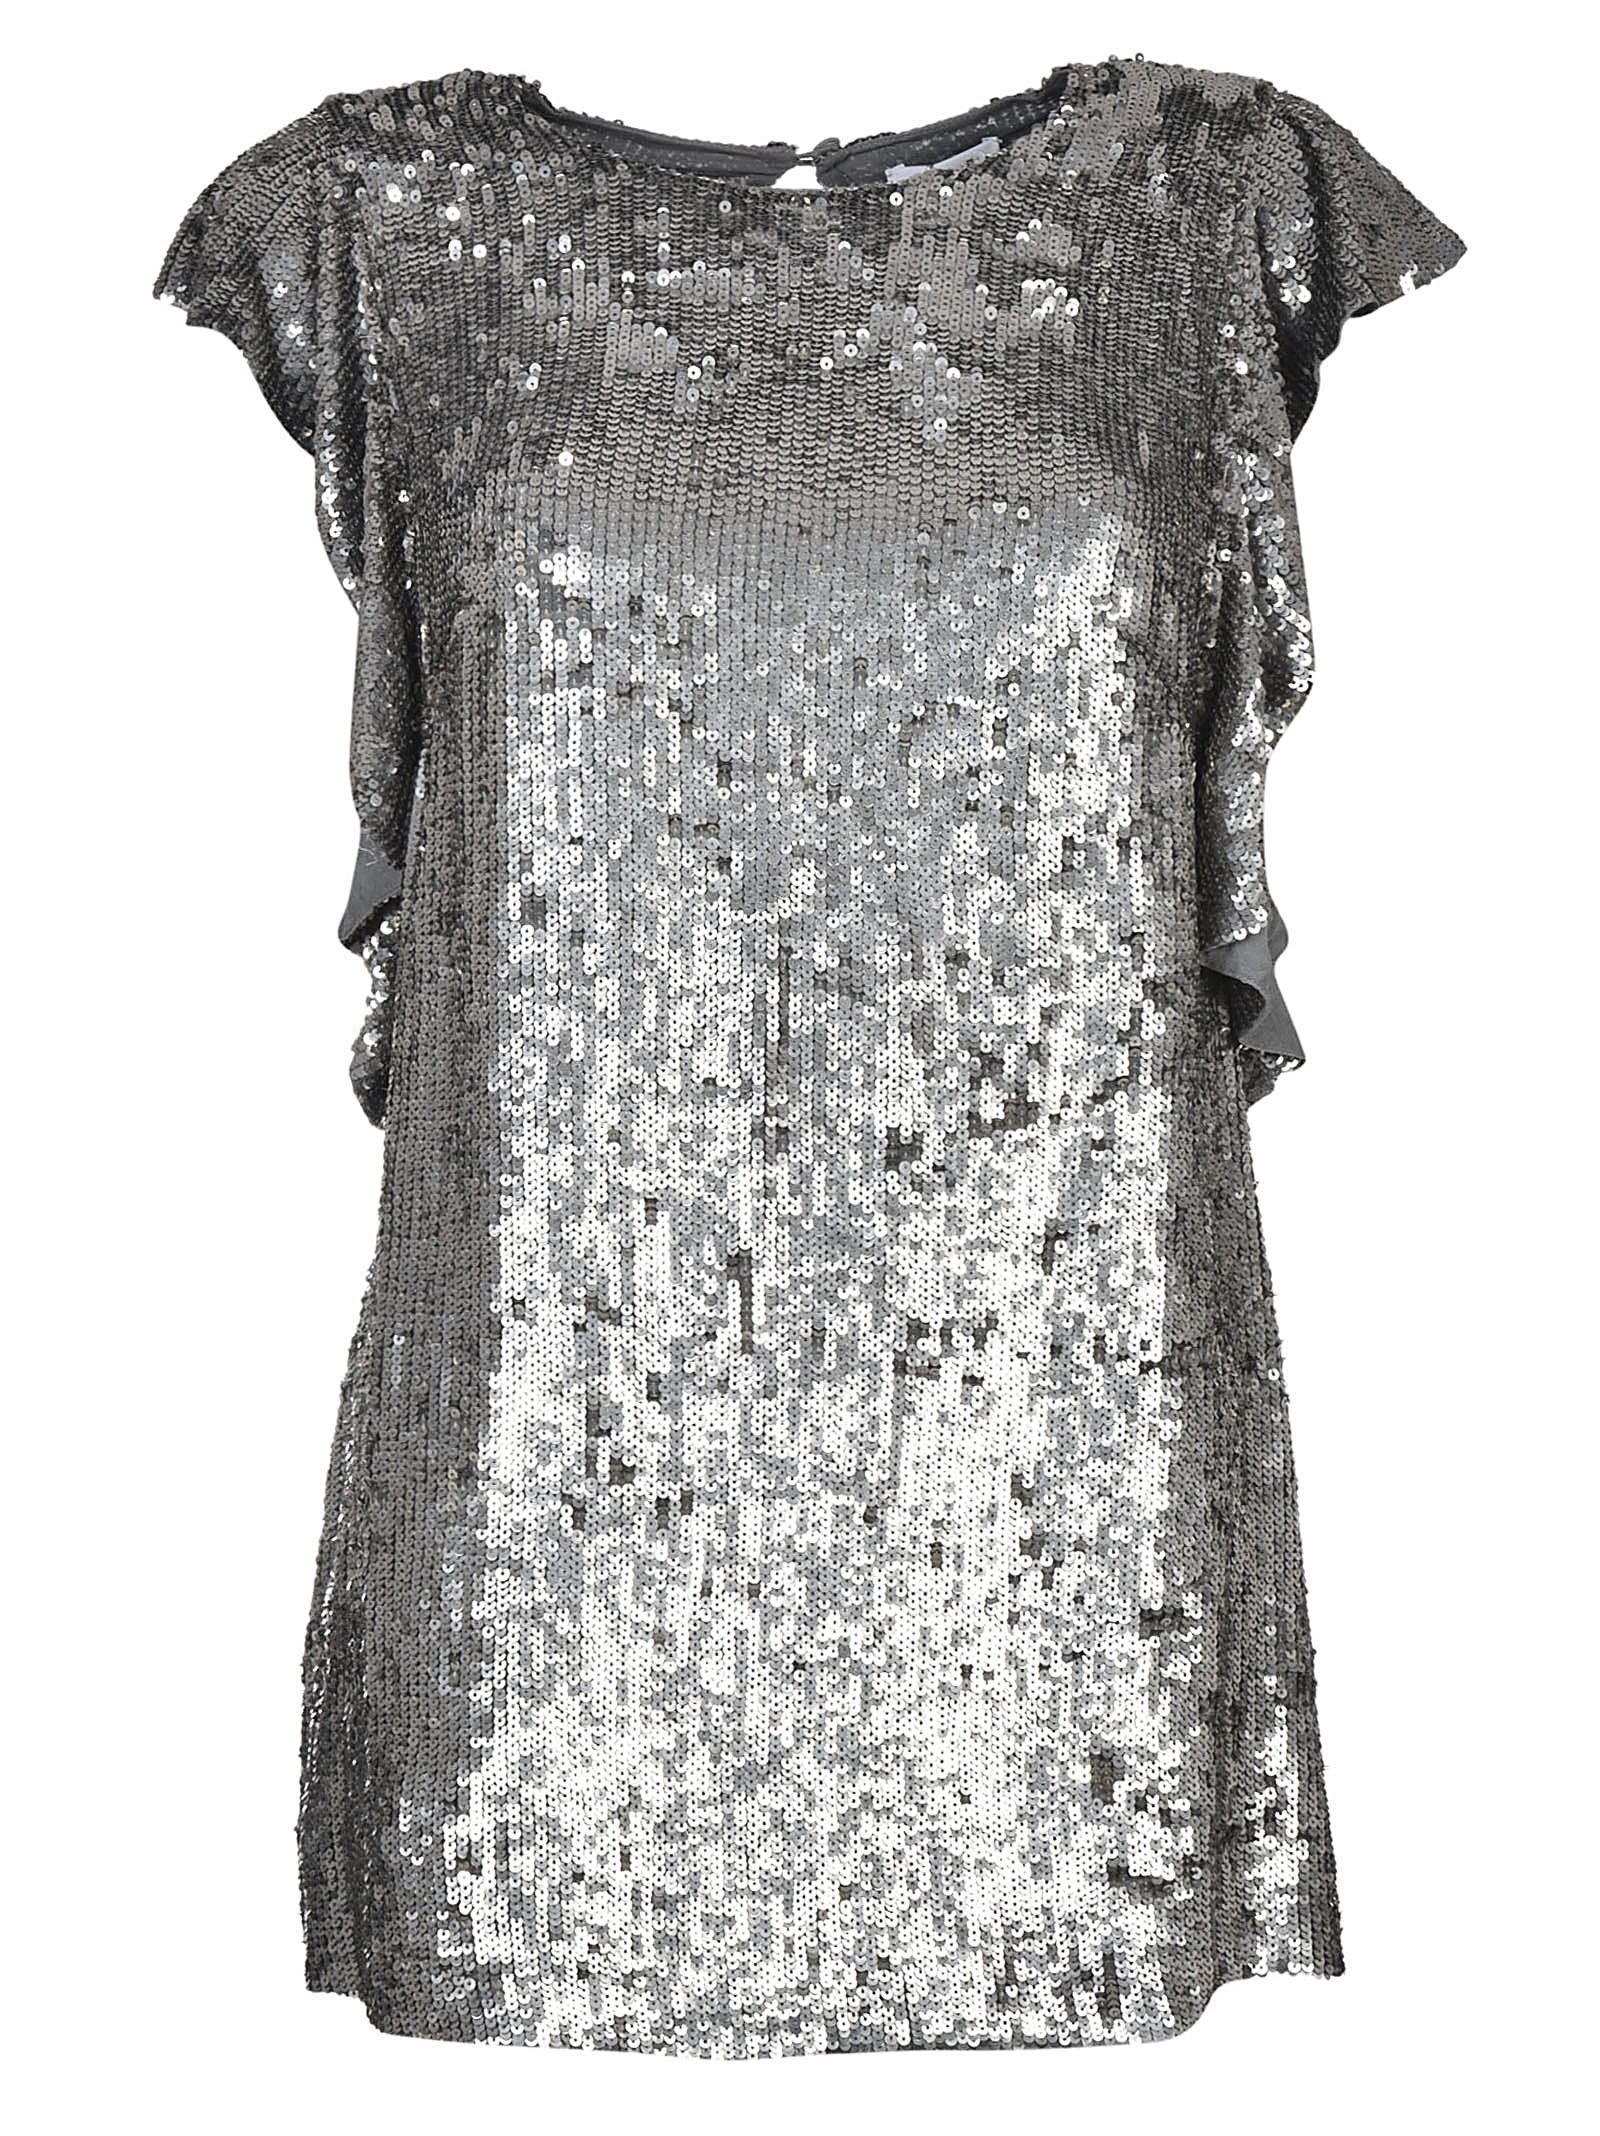 Parosh Sequin Detailed Top